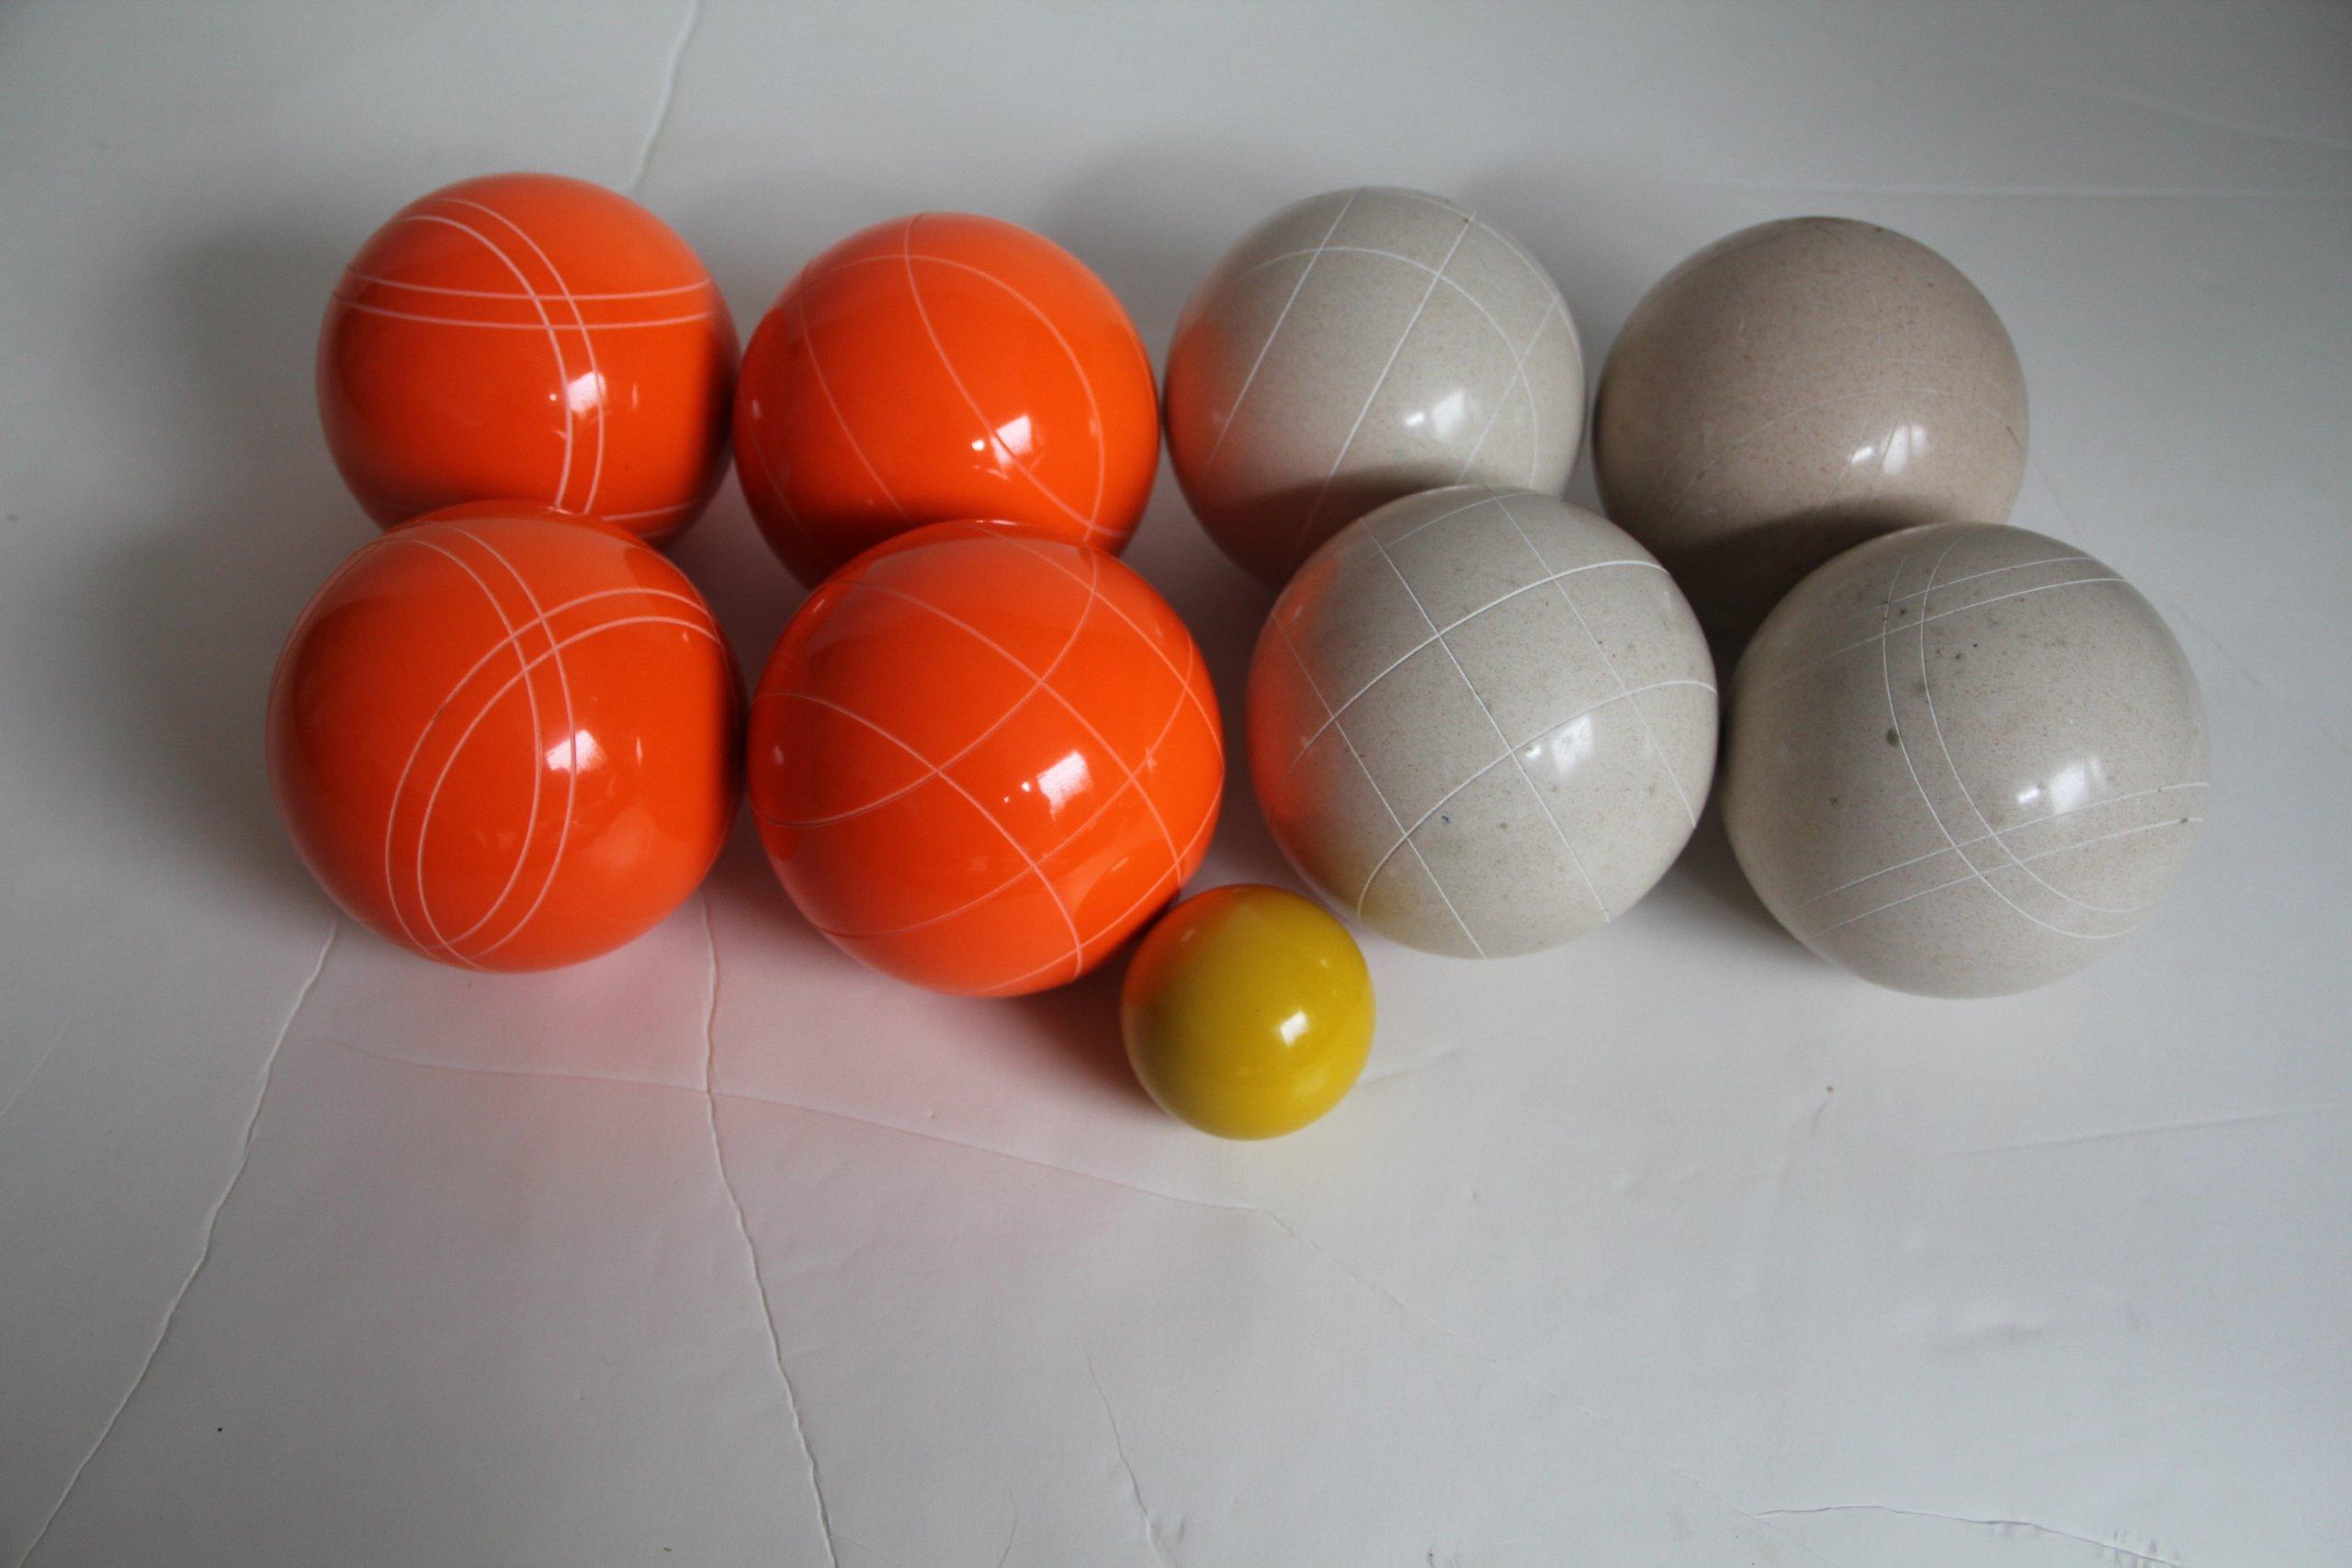 Premium Quality EPCO Tournament Set - 110mm White and Orange Bocce Balls - NO BAG OPTION [Toy]